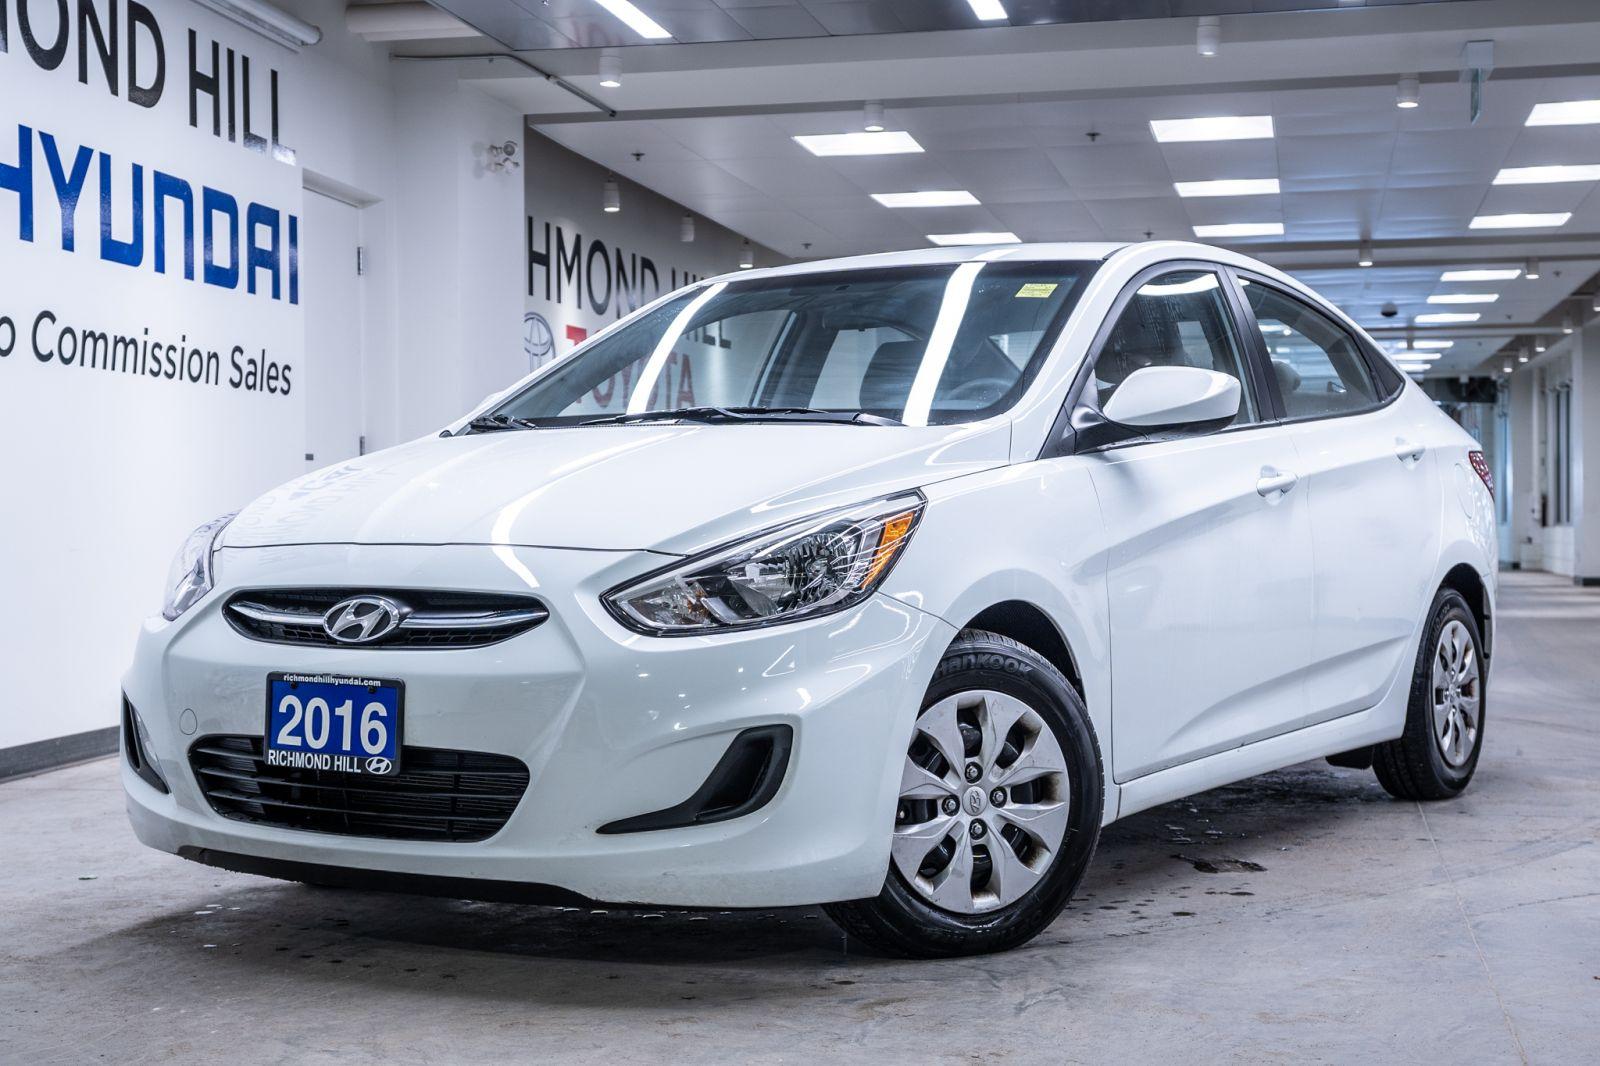 2016 Hyundai Accent Image